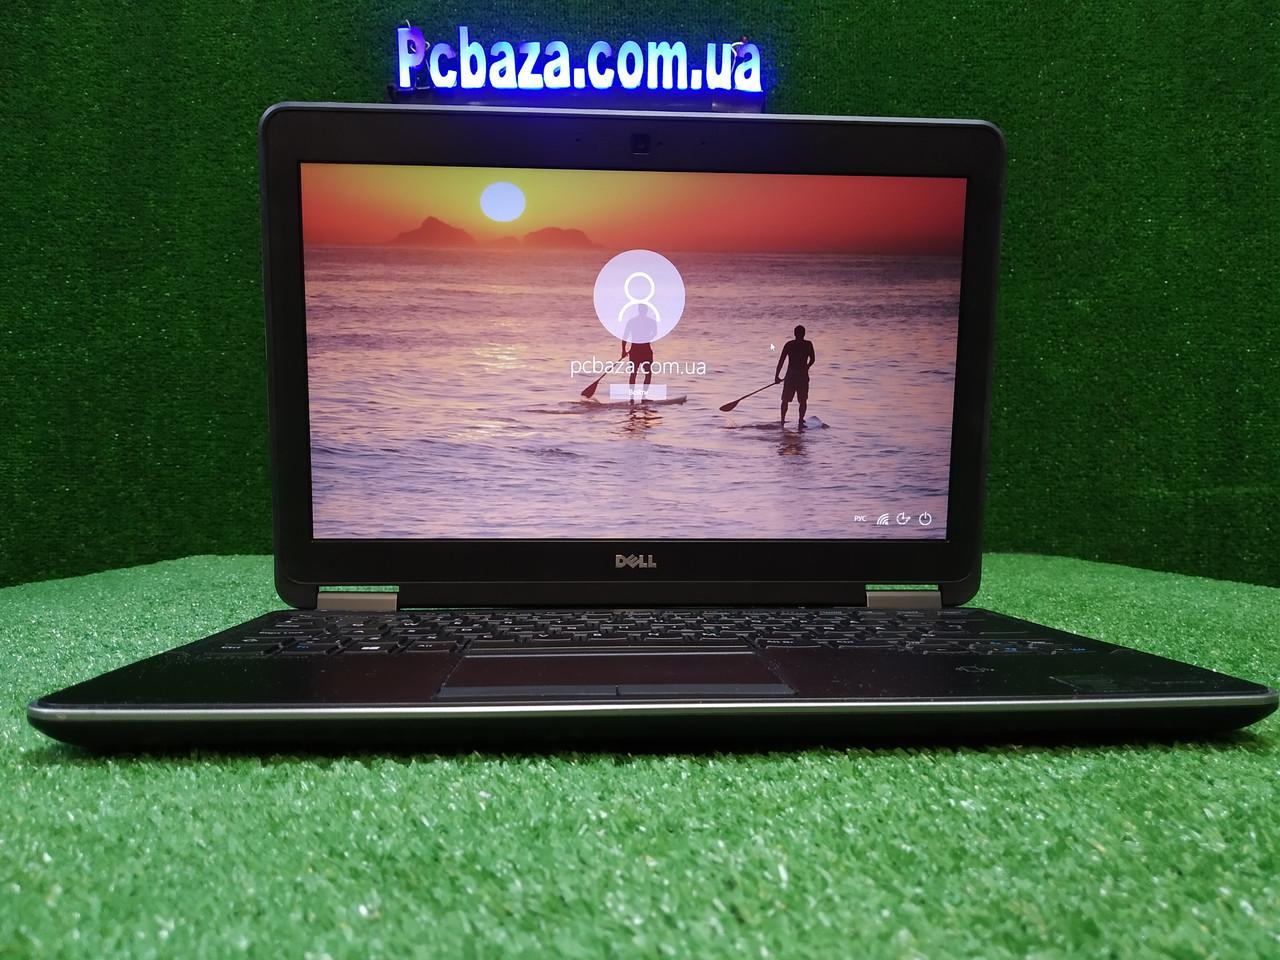 "12,5""  Ультрабук Dell Latitude e7240 \ Inte Core i3 4010u 1.7\ 8 ГБ \ 128 ГБ SSD \ Батарея до 5 ч Настроен!"